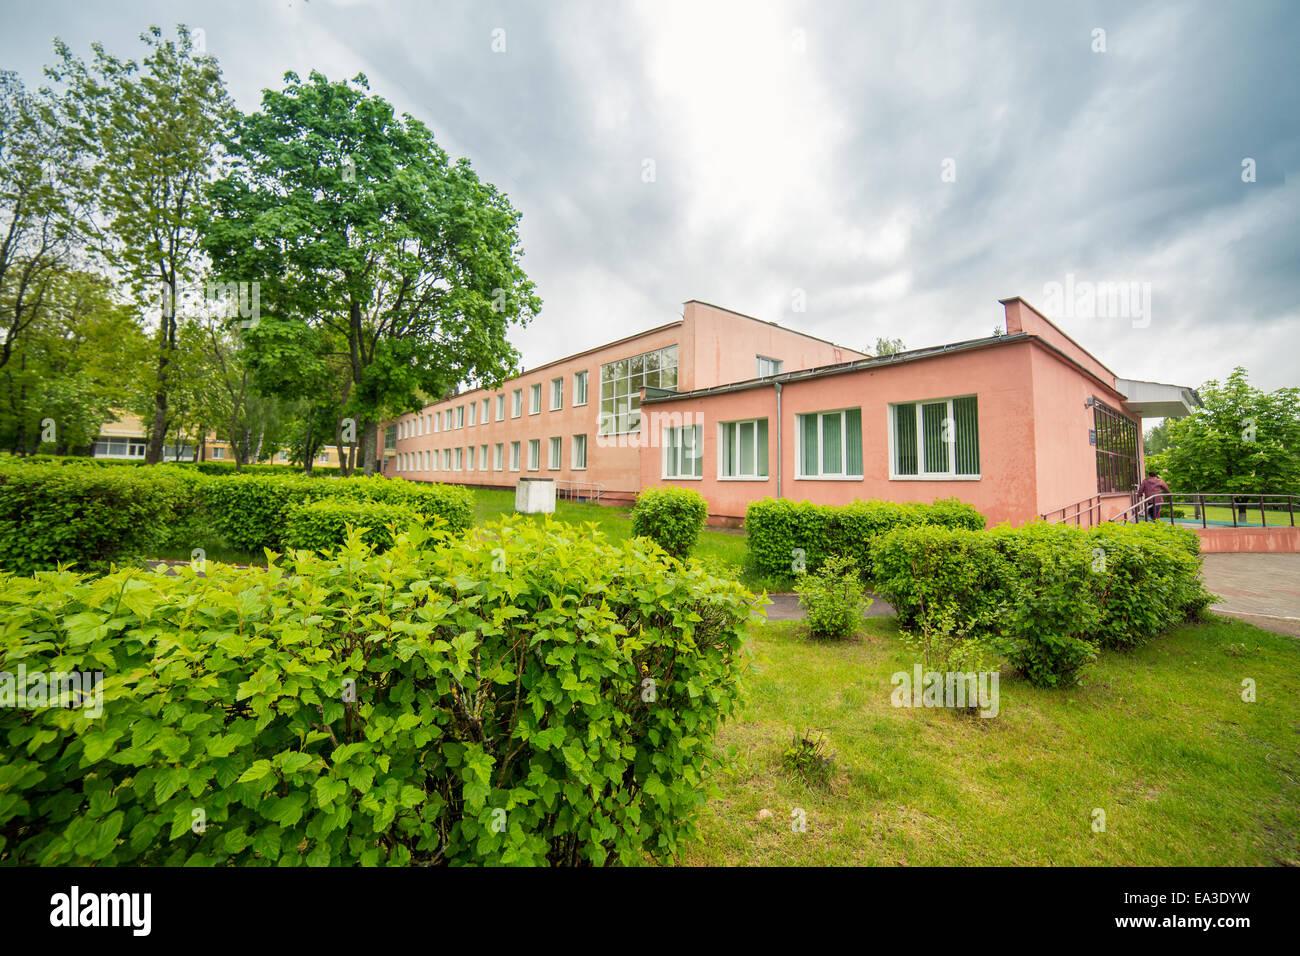 Hotel building, Minsk region, Belarus - Stock Image